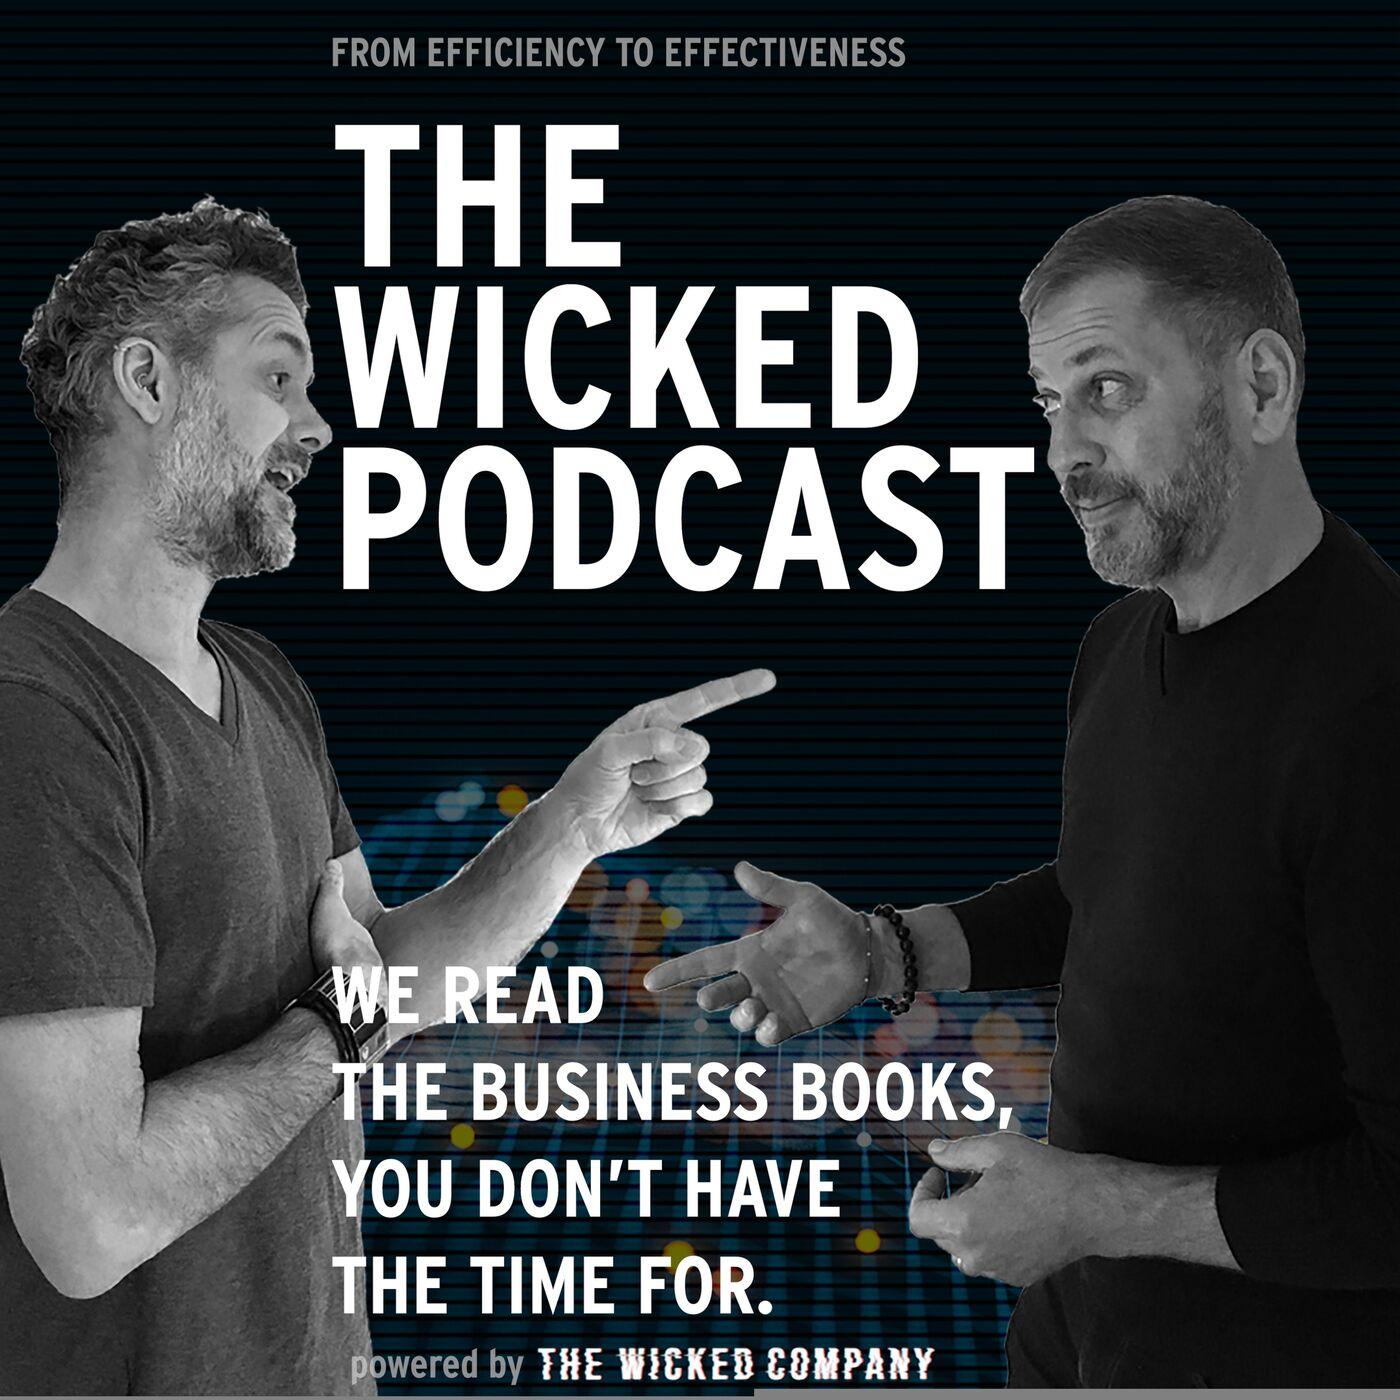 Jack Uldrich: Business as Unusual